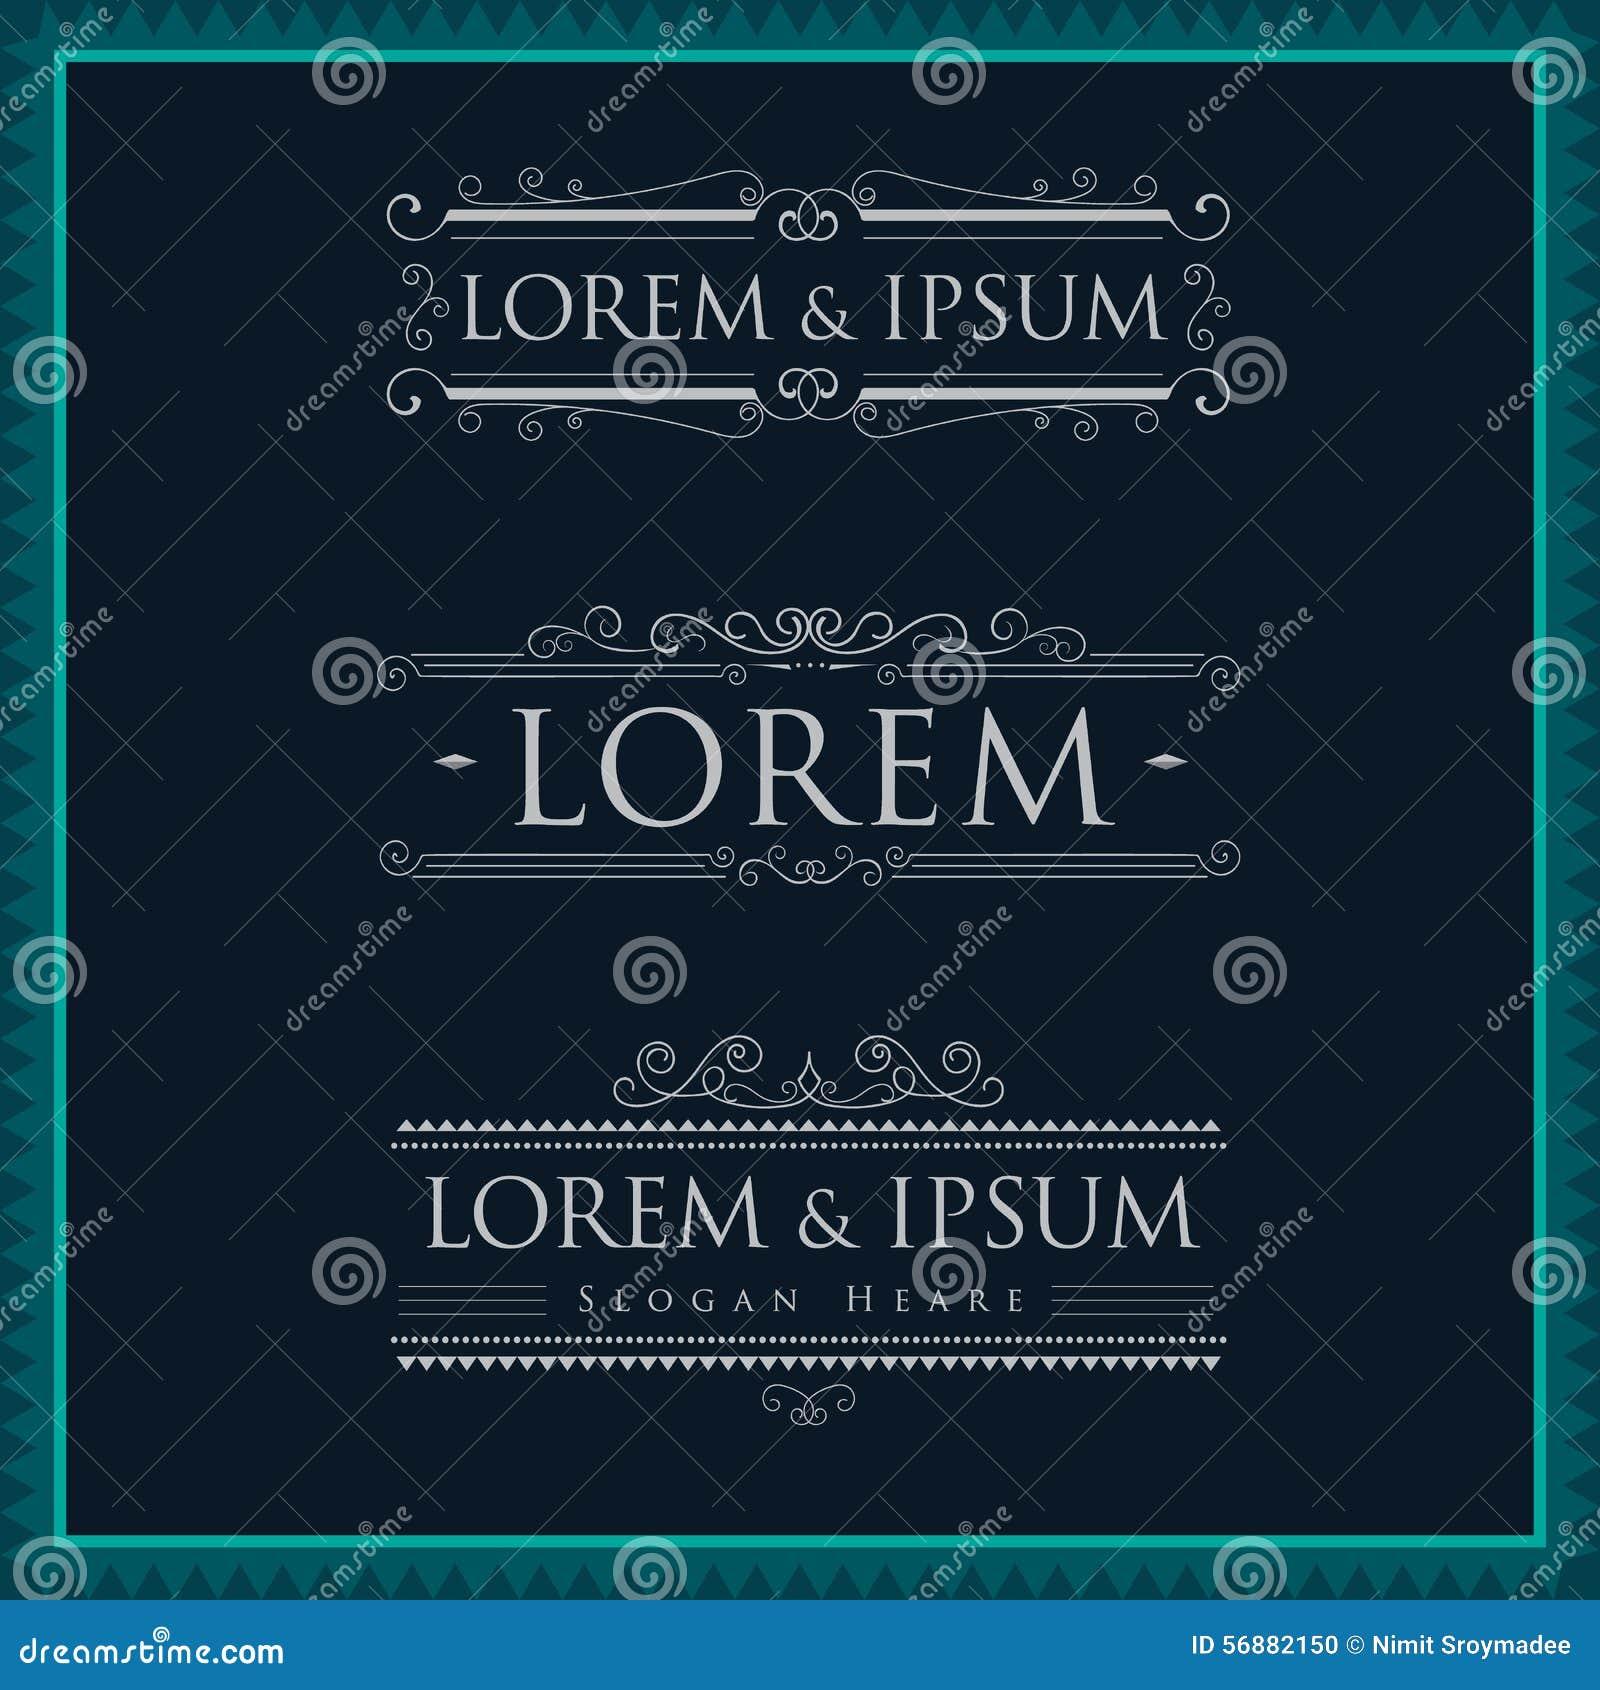 Luxury logos template calligraphy flourishes